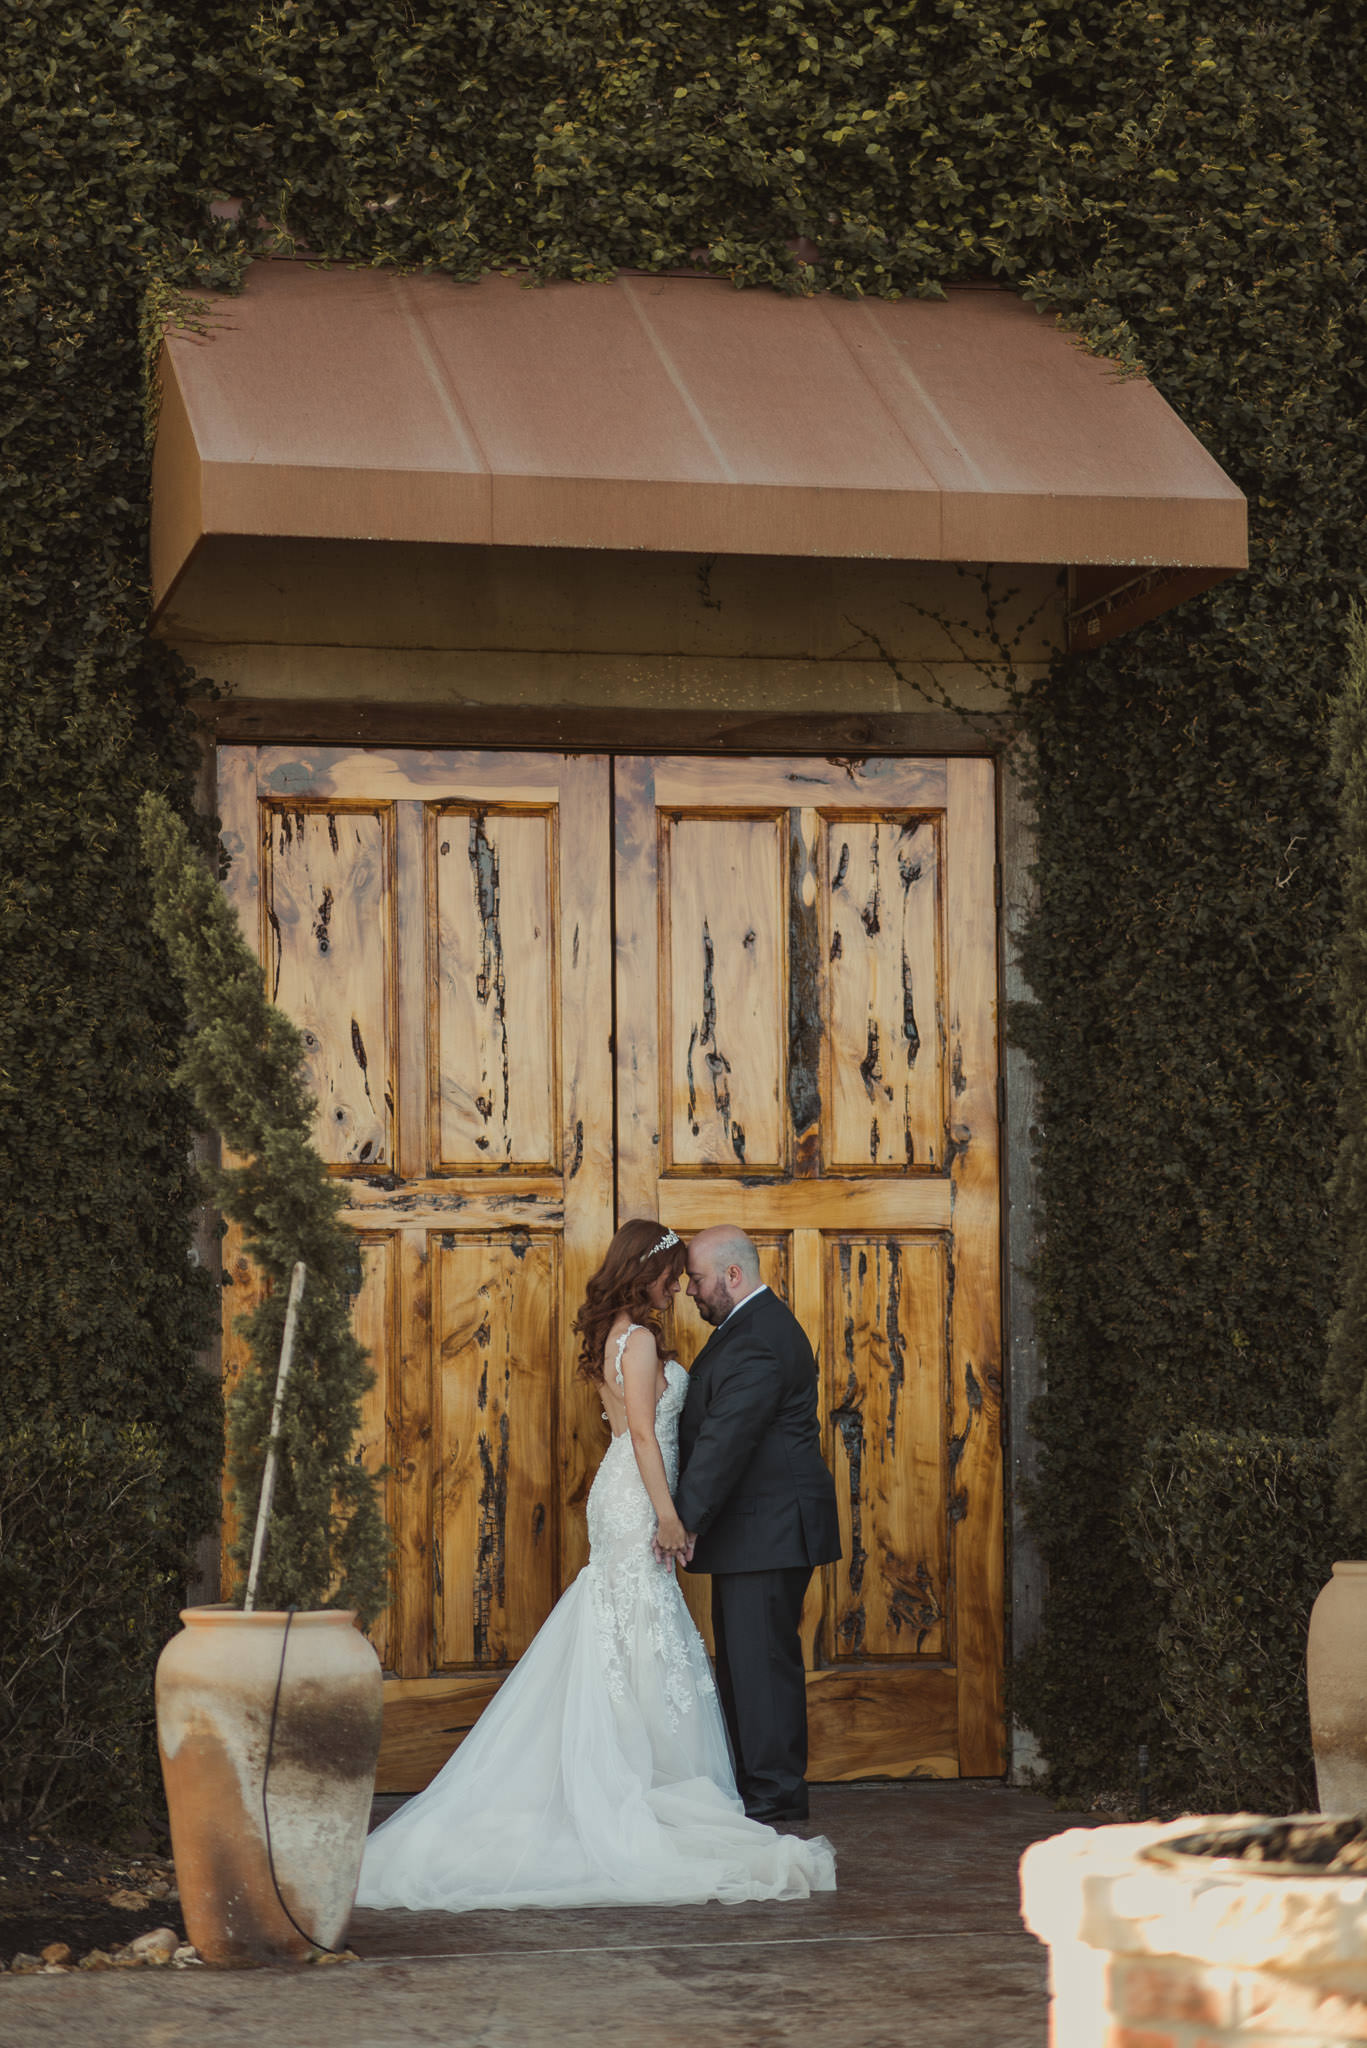 Cynthia-Curtis-Olde-Dobbine-Station-Houston-Wedding-Photographer-sm-50.jpg